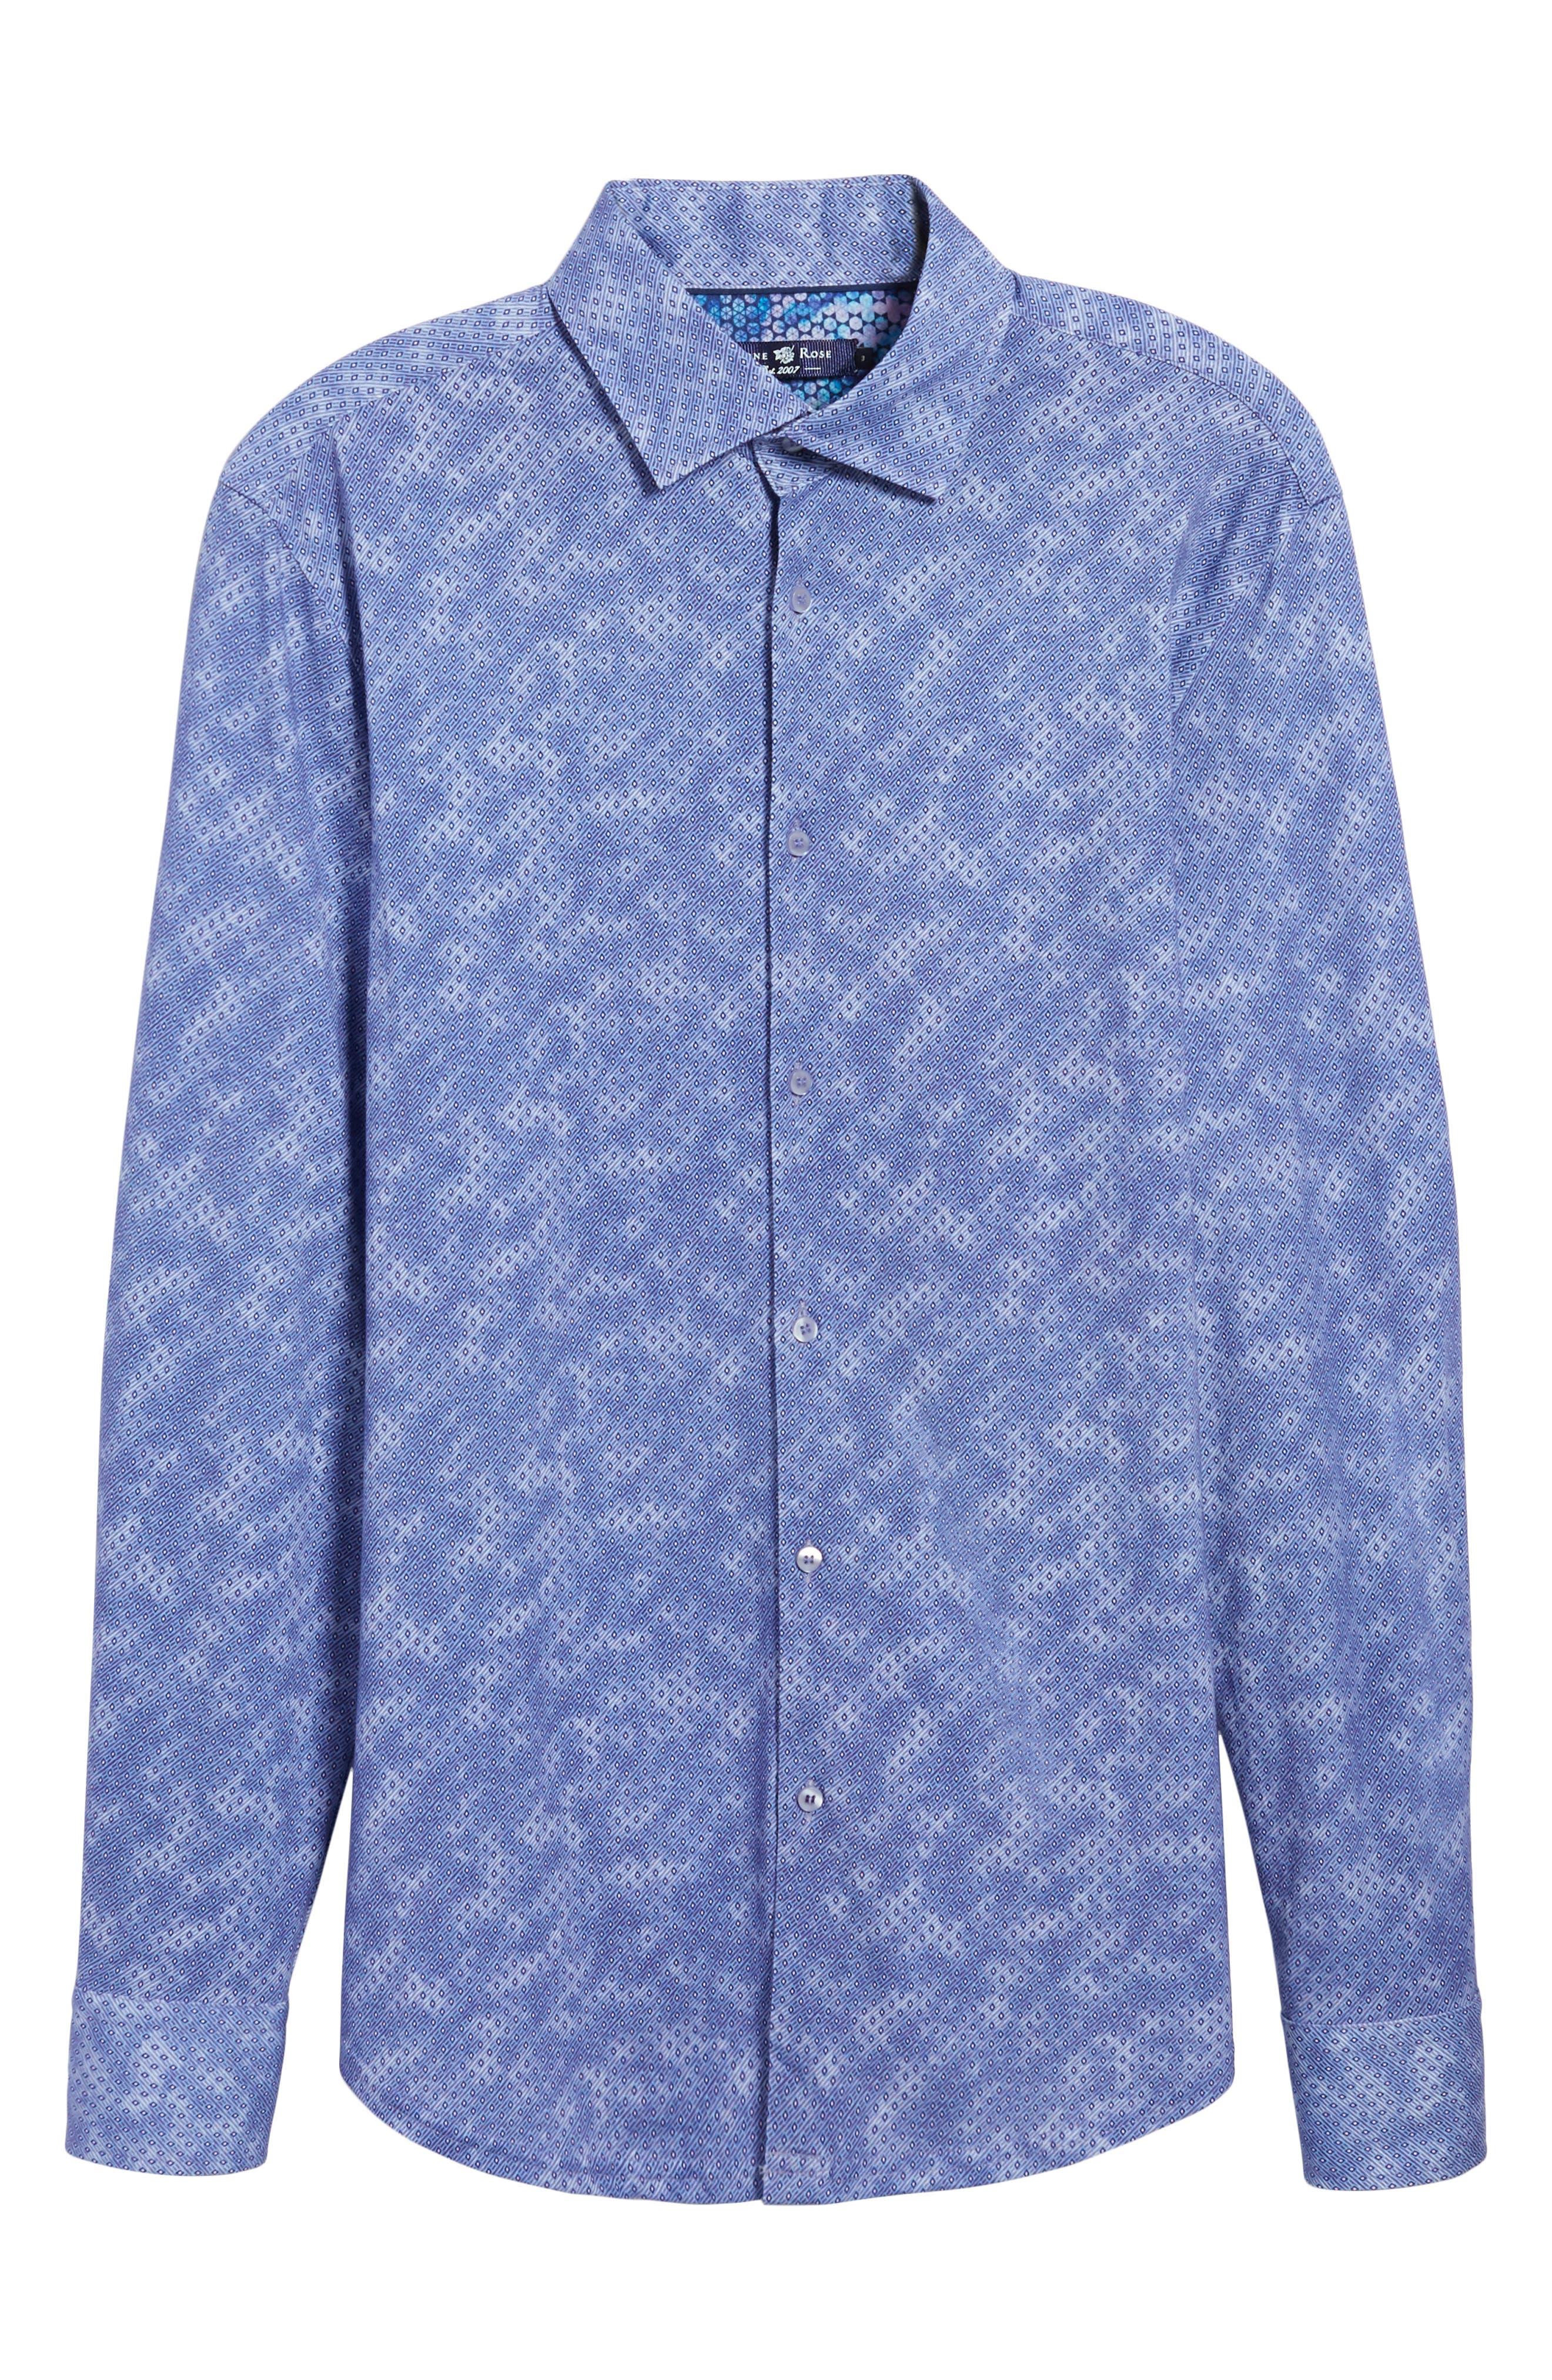 Slim Fit Wavy Diamond Print Sport Shirt,                             Alternate thumbnail 6, color,                             400